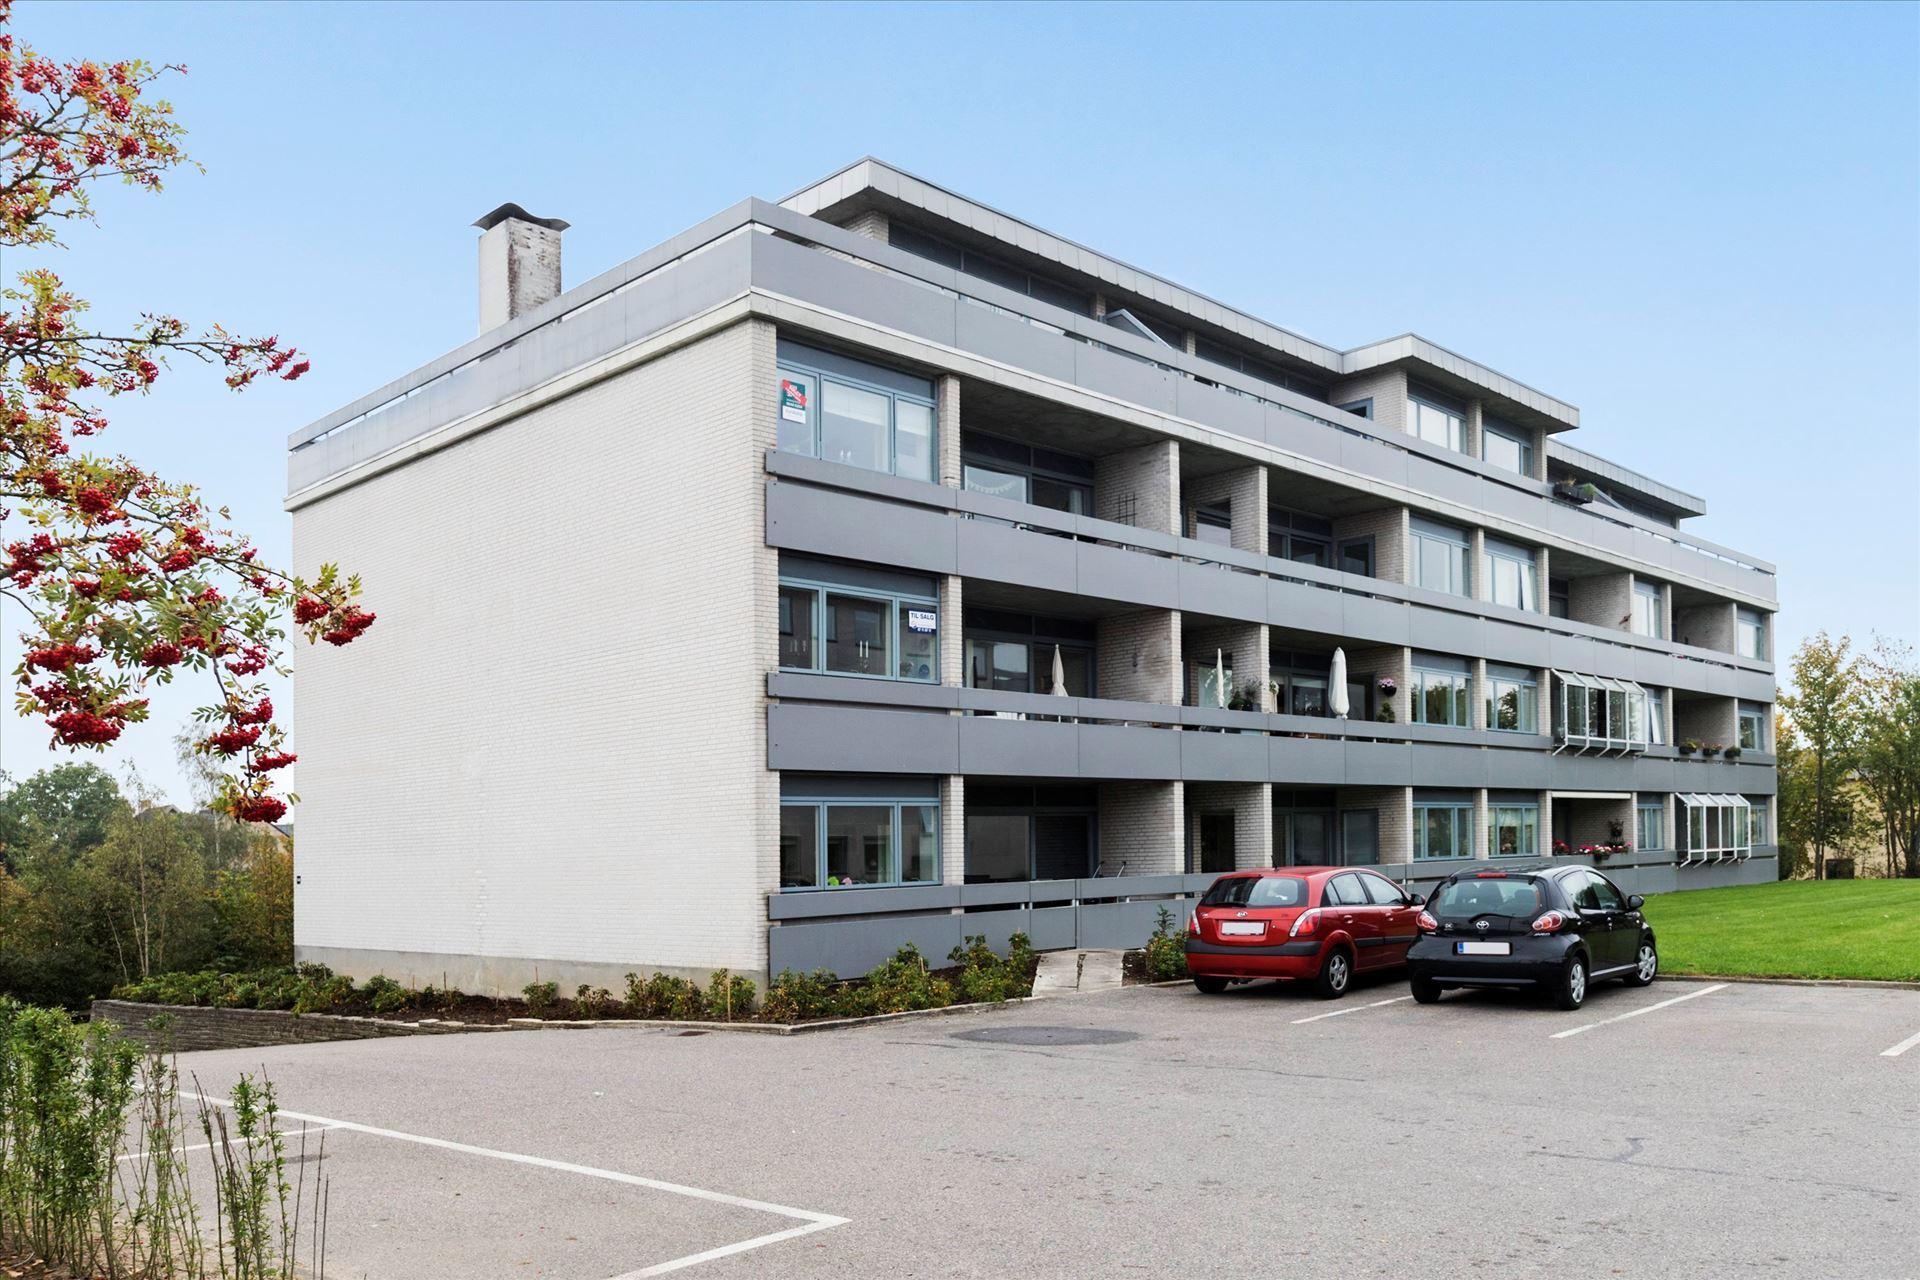 Mølletoften 1, 1. TH, 8940 Randers SV